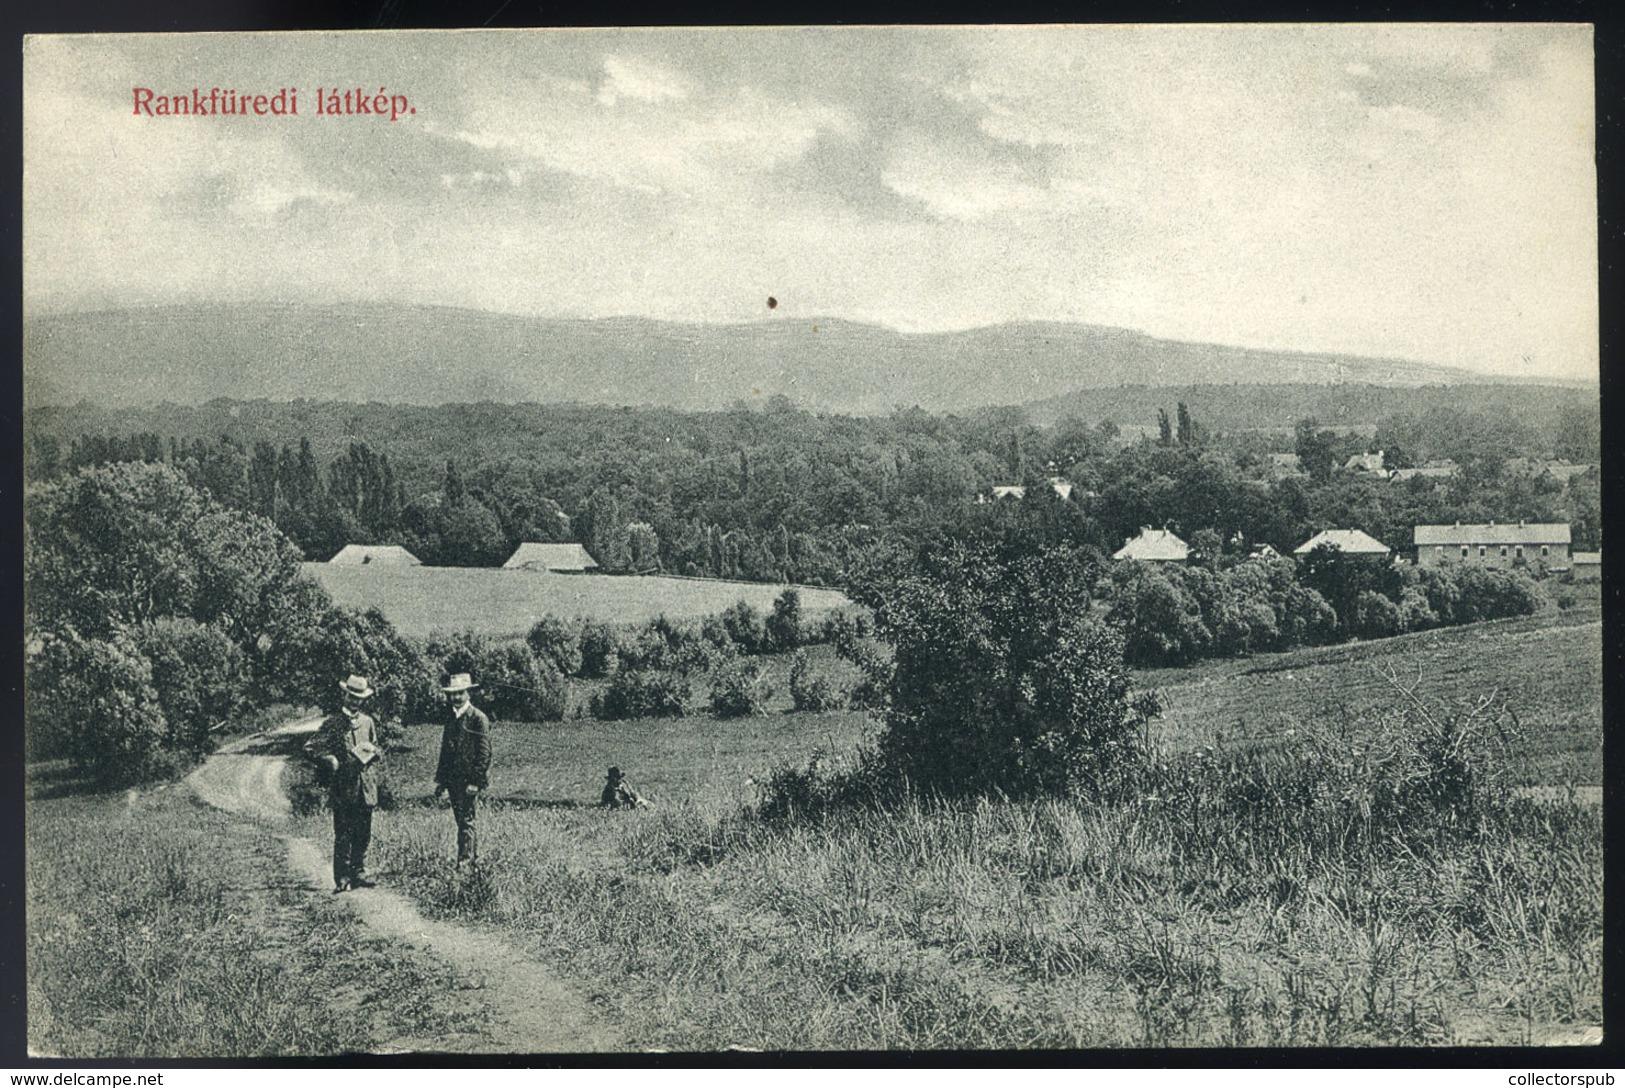 HUNGARY SLOVAKIA /  RÁNKFÜRED 1915 Vintage Picture Postcard - Hungary